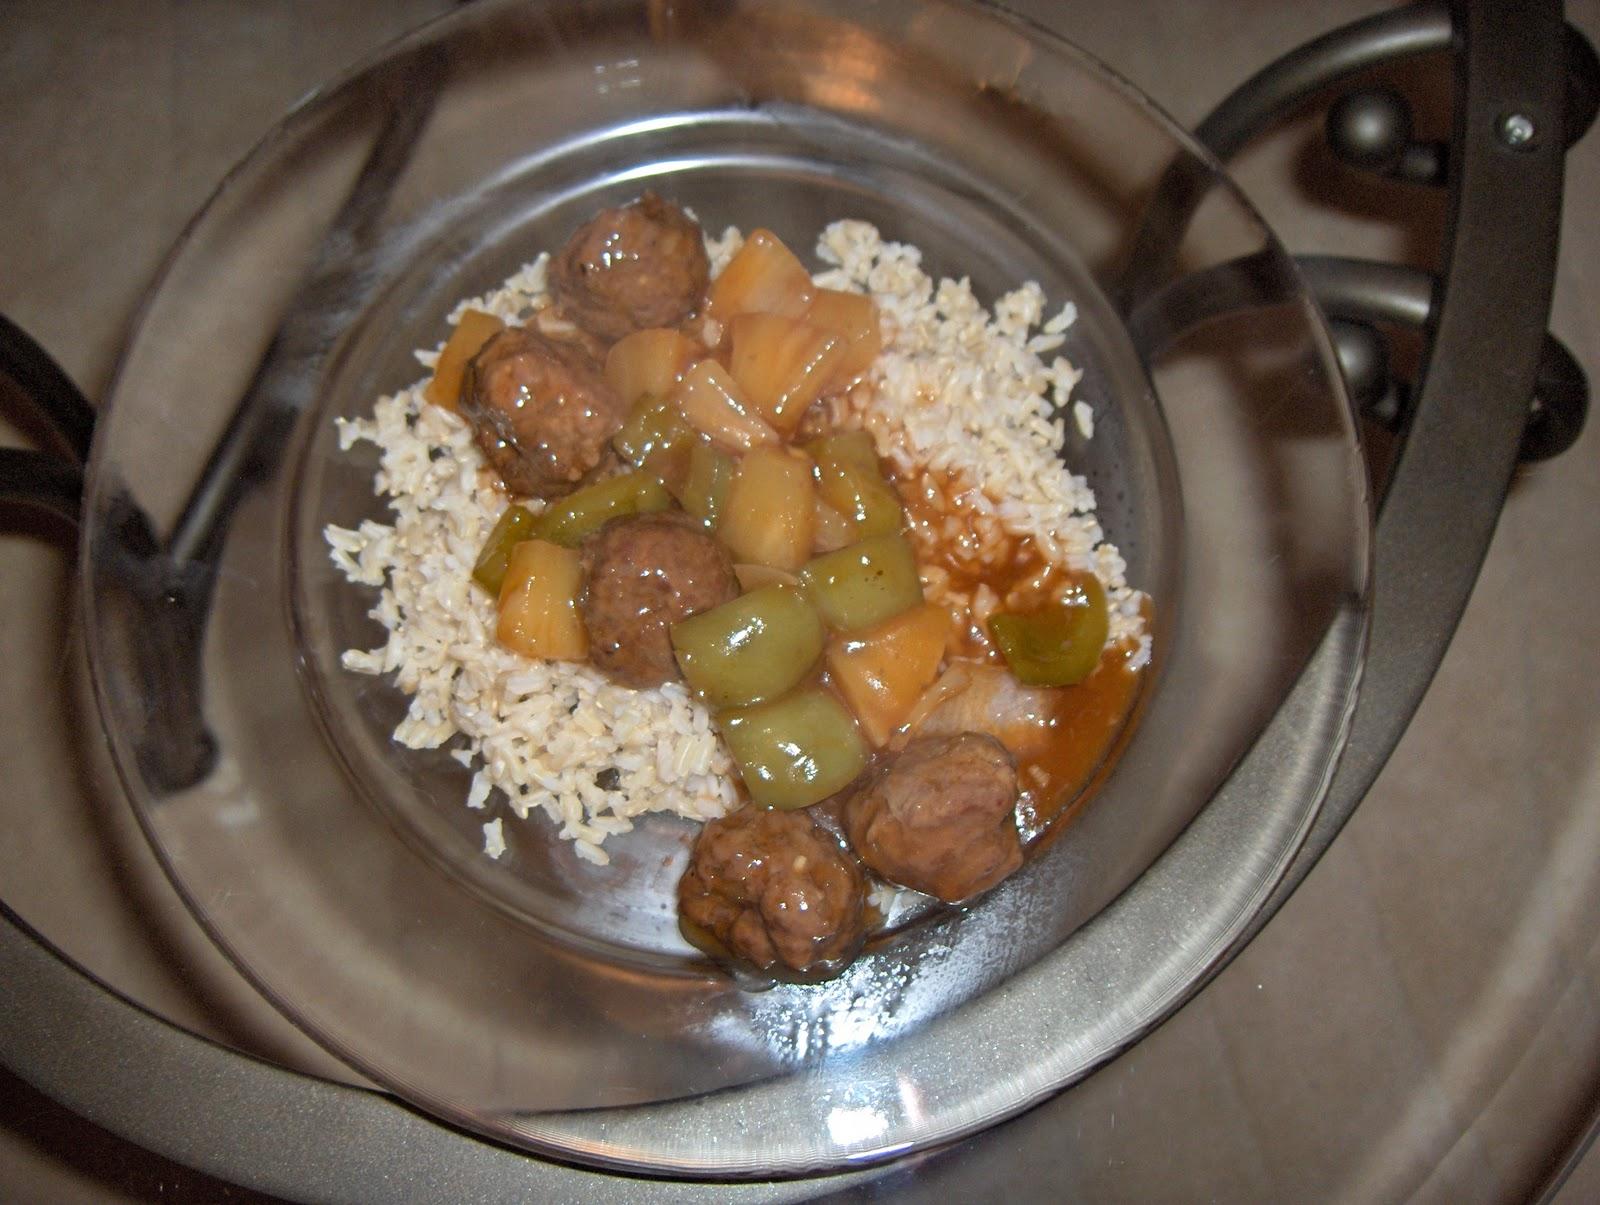 dinner at julie's: Polynesian Meatballs